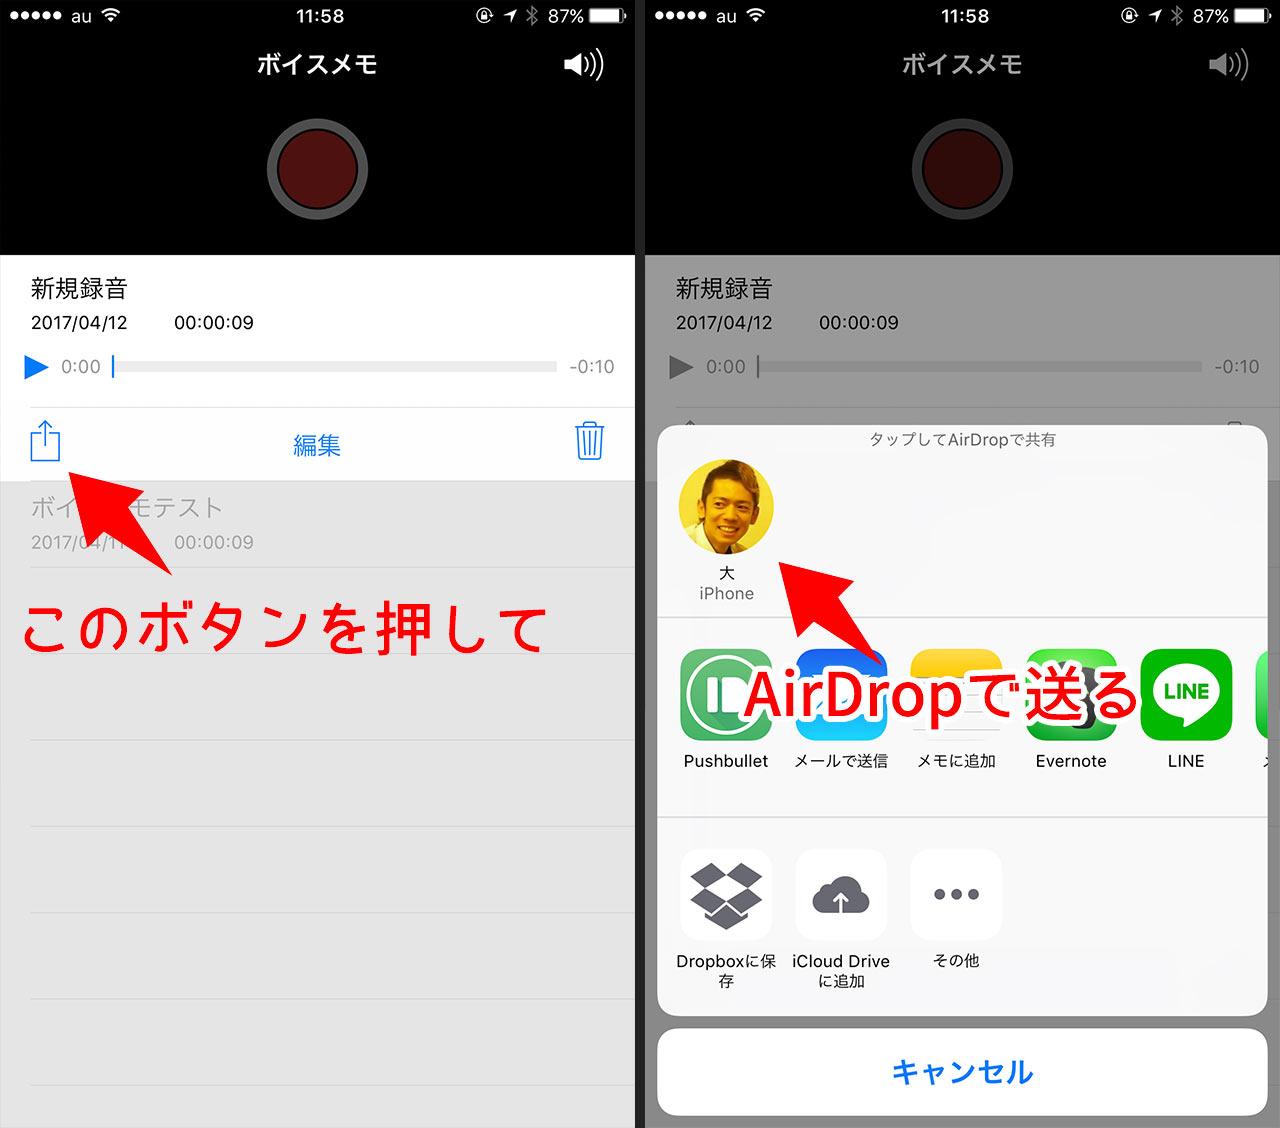 iPhoneのボイスメモアプリで録音したデータをAirDropで送信する